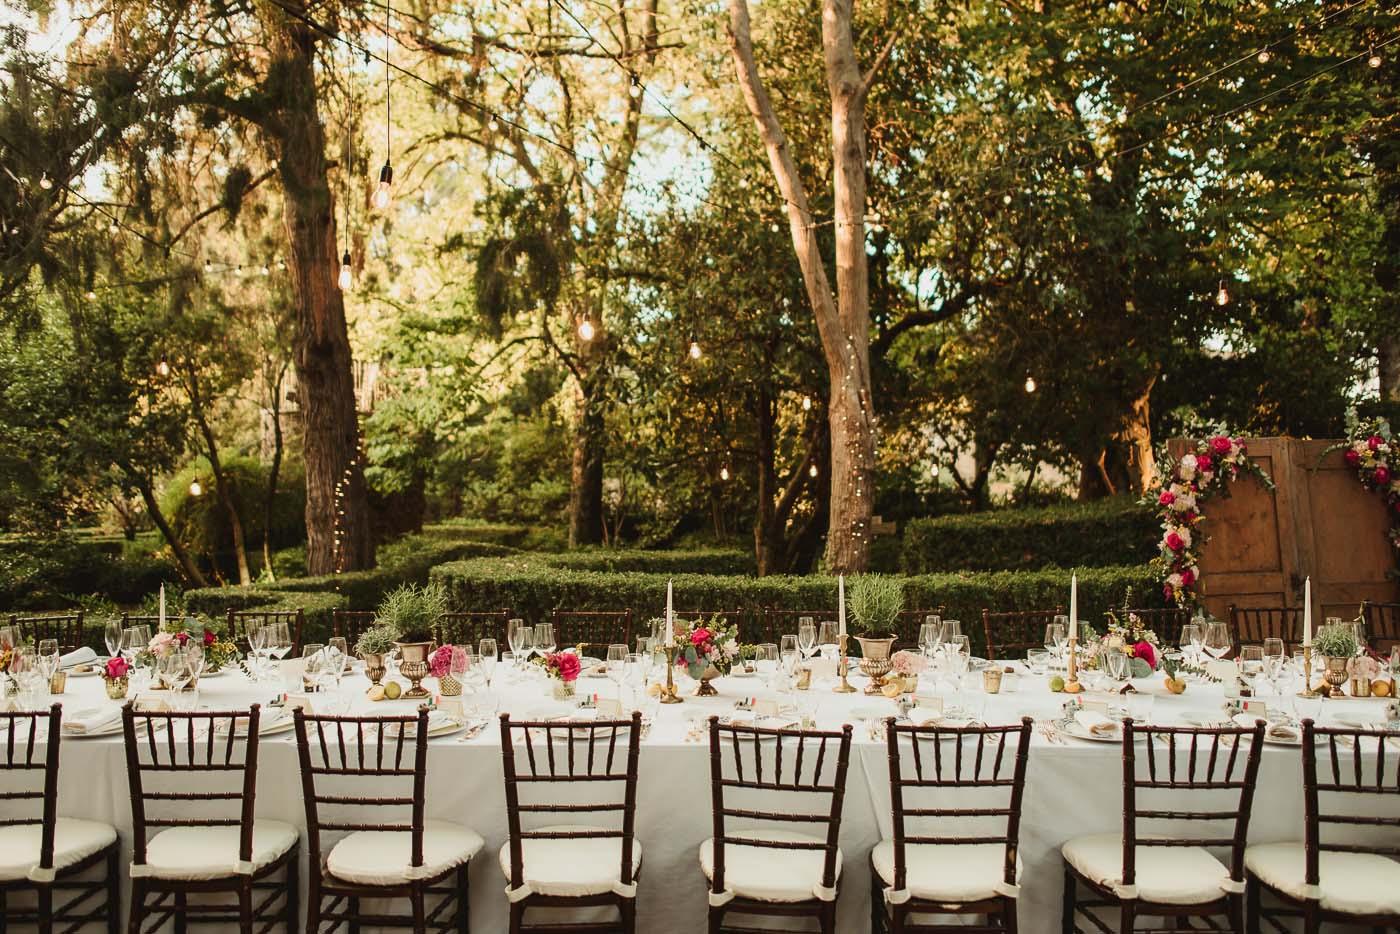 Relaxed-wedding-borgo-stomennano-1175